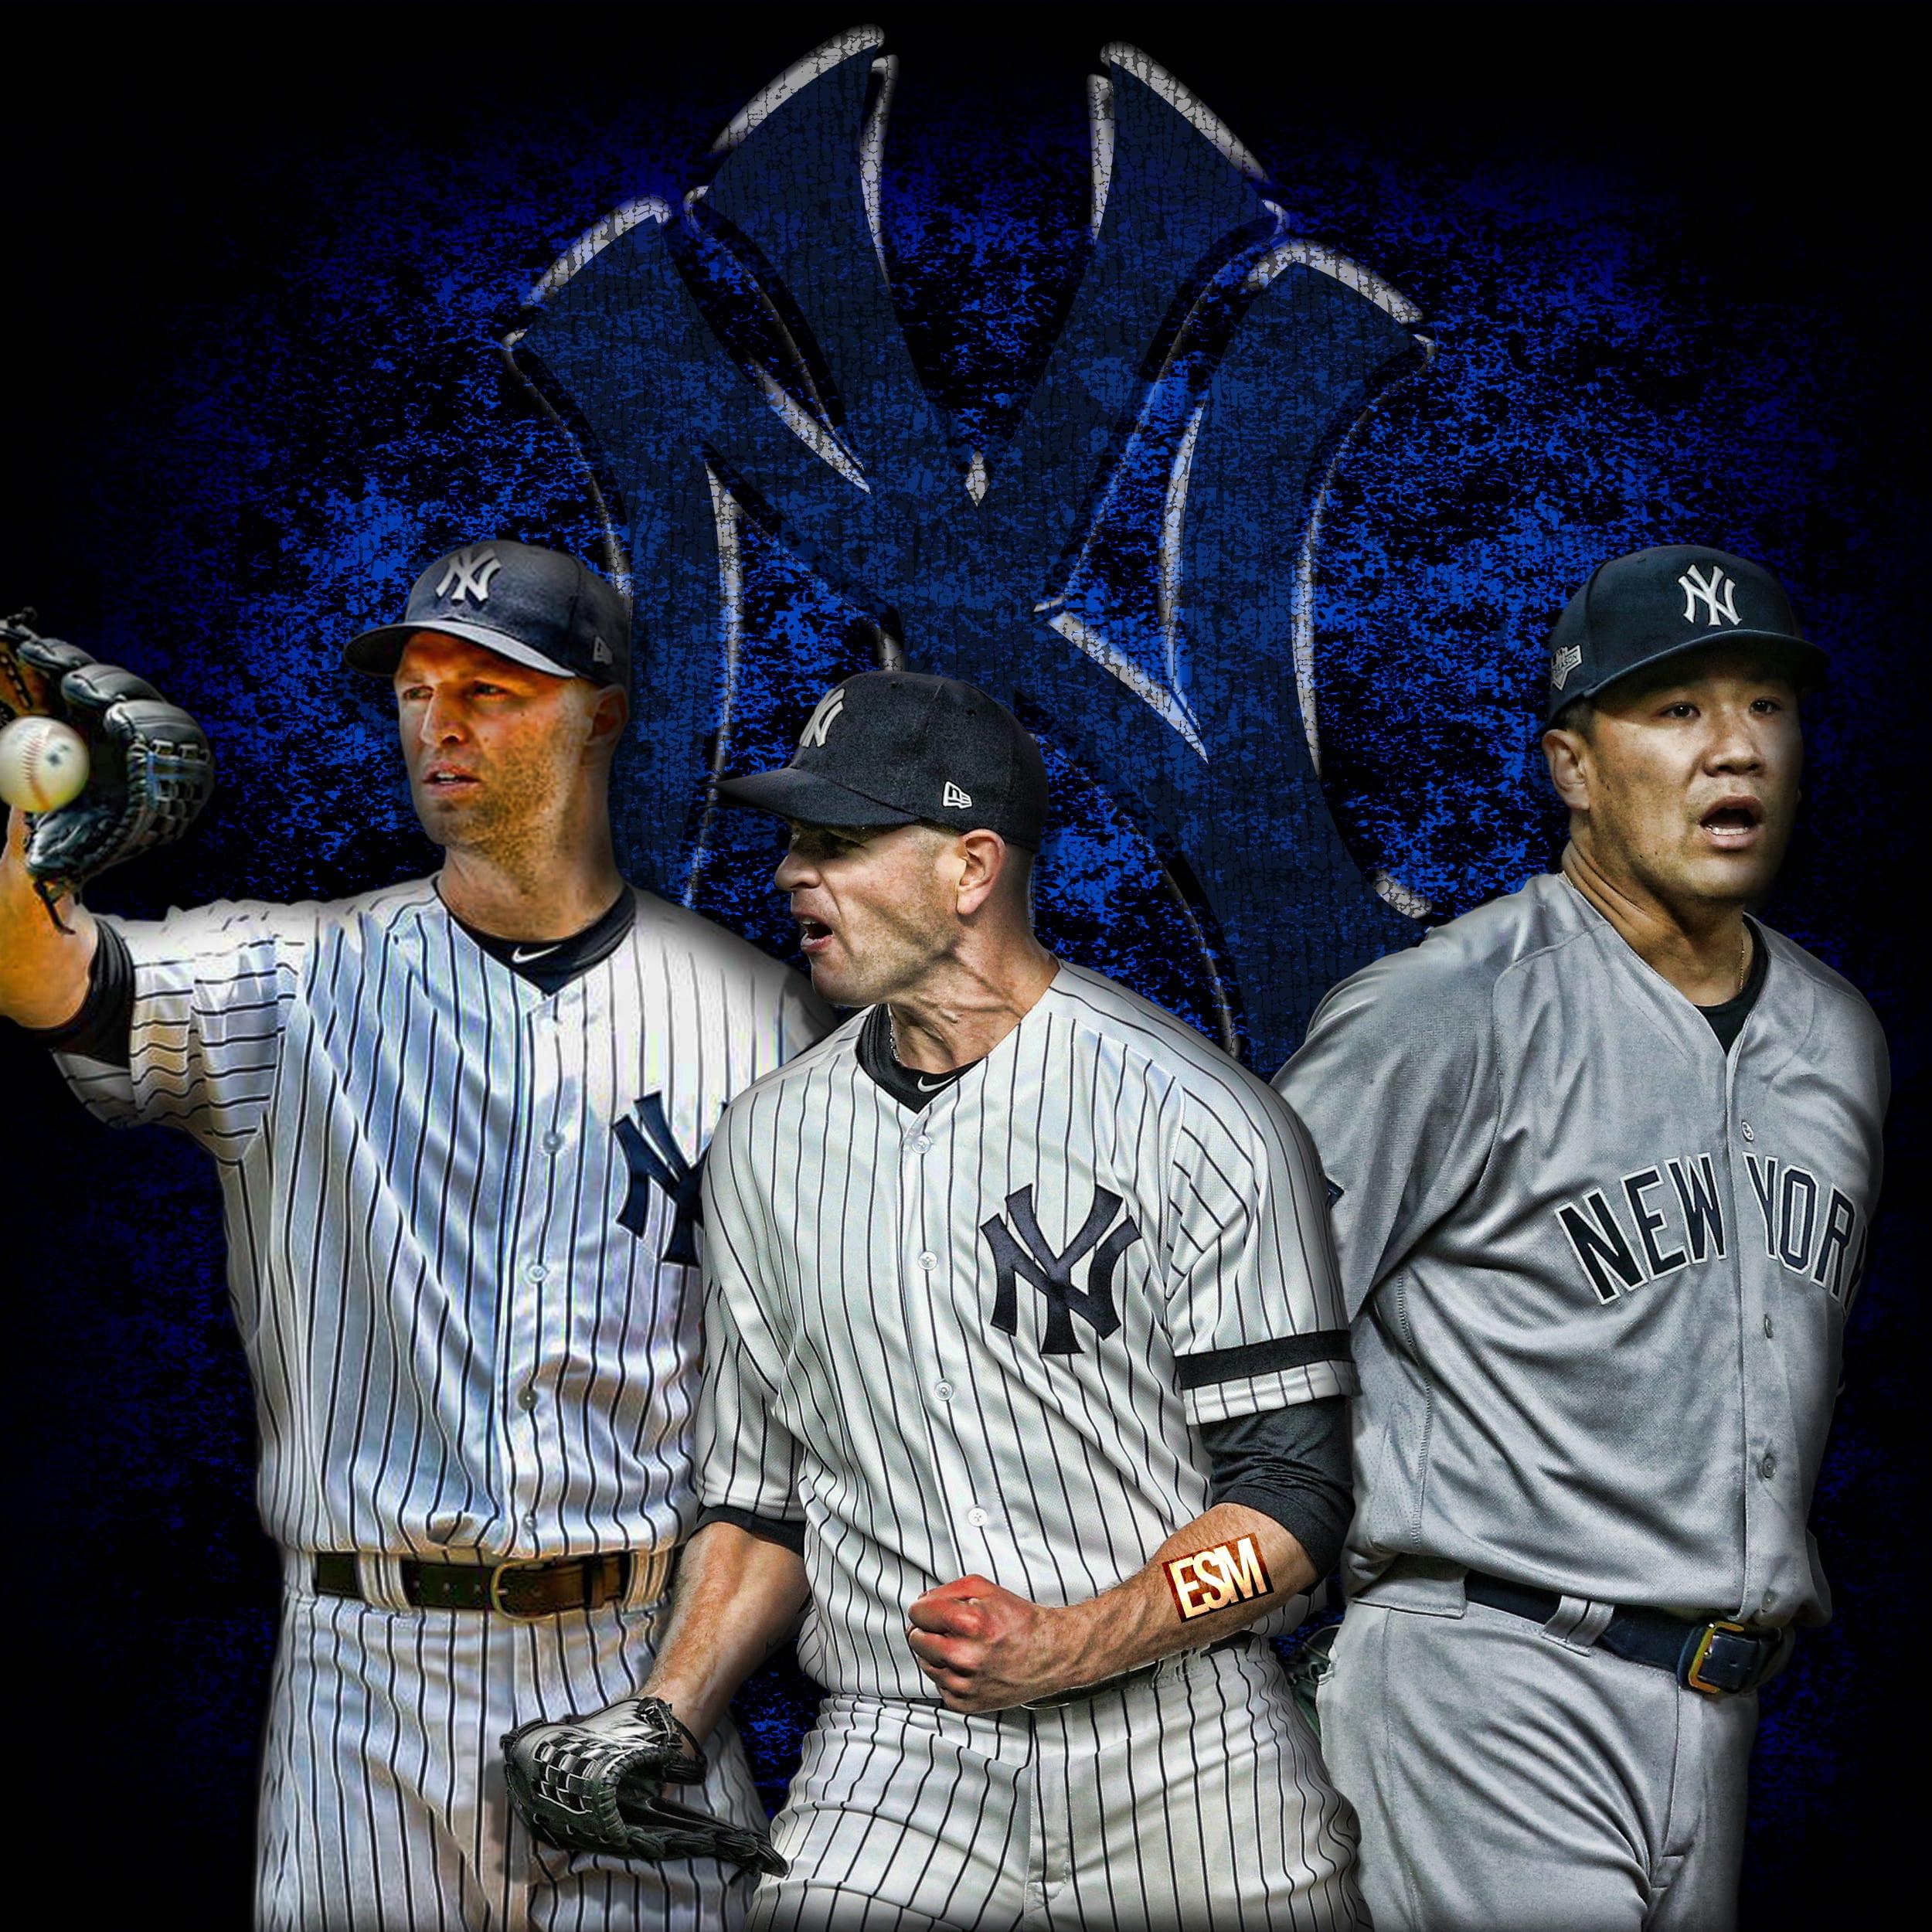 New York Yankees, Masahiro Tanaka, J.A. Happ, James Paxton